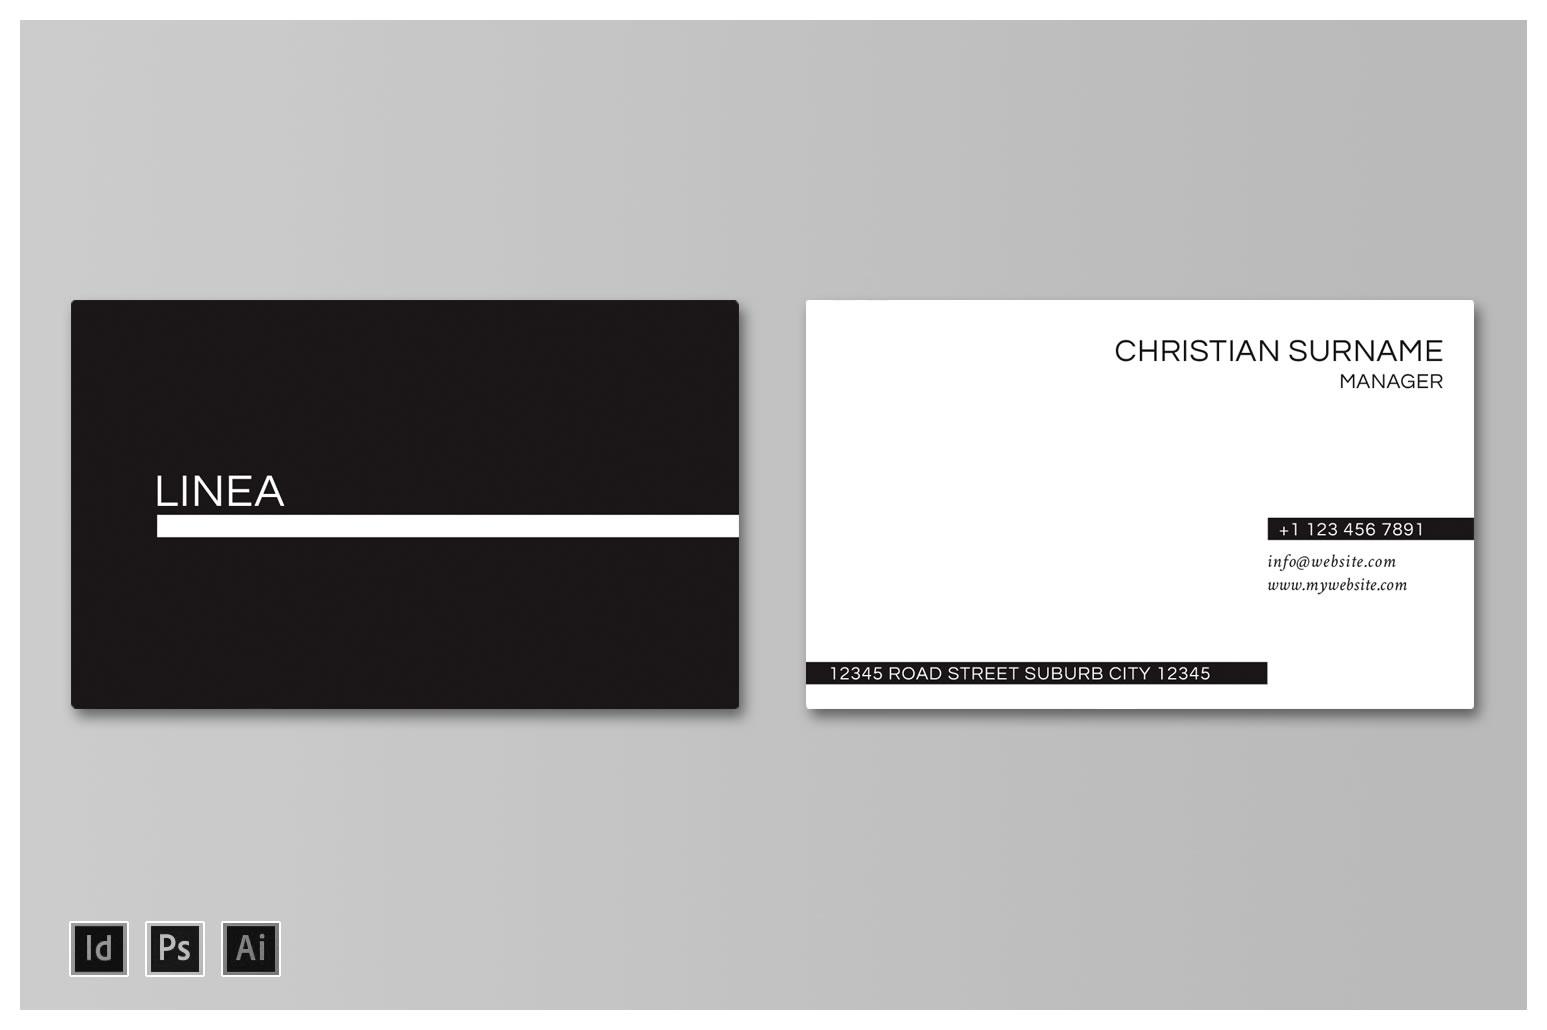 Linea Business Card Mockup Landscape - Nectarine NZ - 06 379 5277